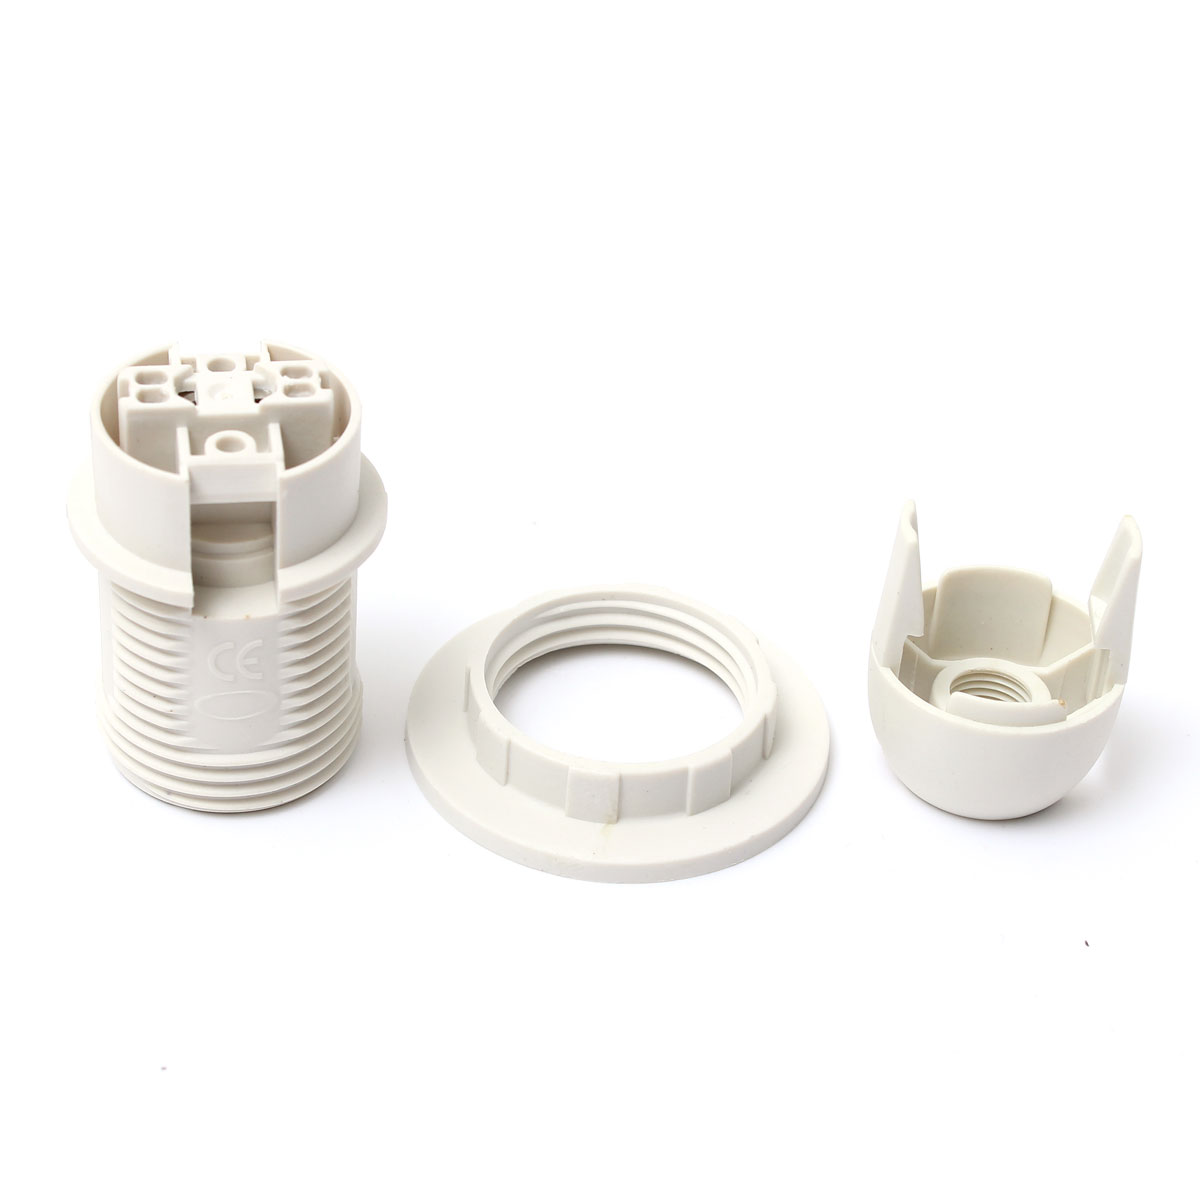 small edison screw ses e14 m10 light bulb lamp holder. Black Bedroom Furniture Sets. Home Design Ideas